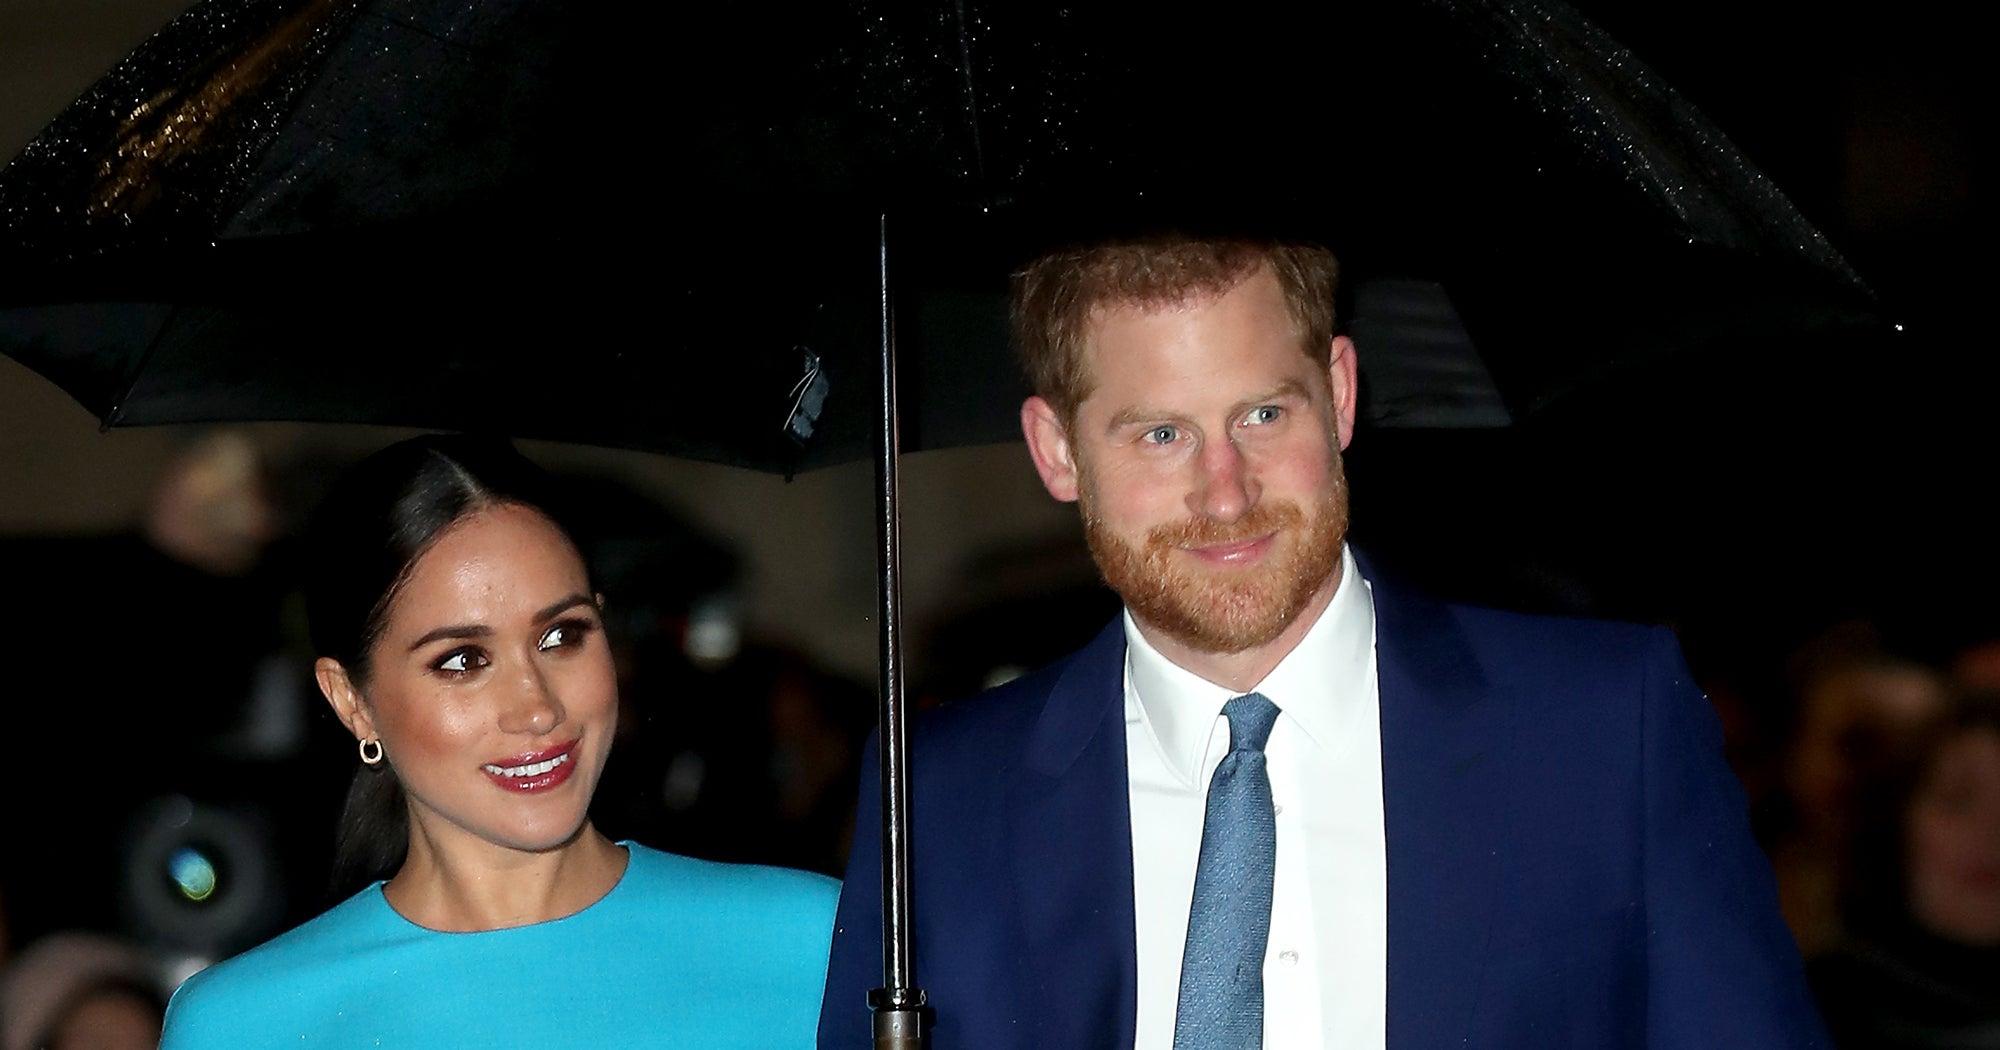 Meghan Markle Prince Harry Have Reportedly Left Canada Amid Coronavirus Outbreak